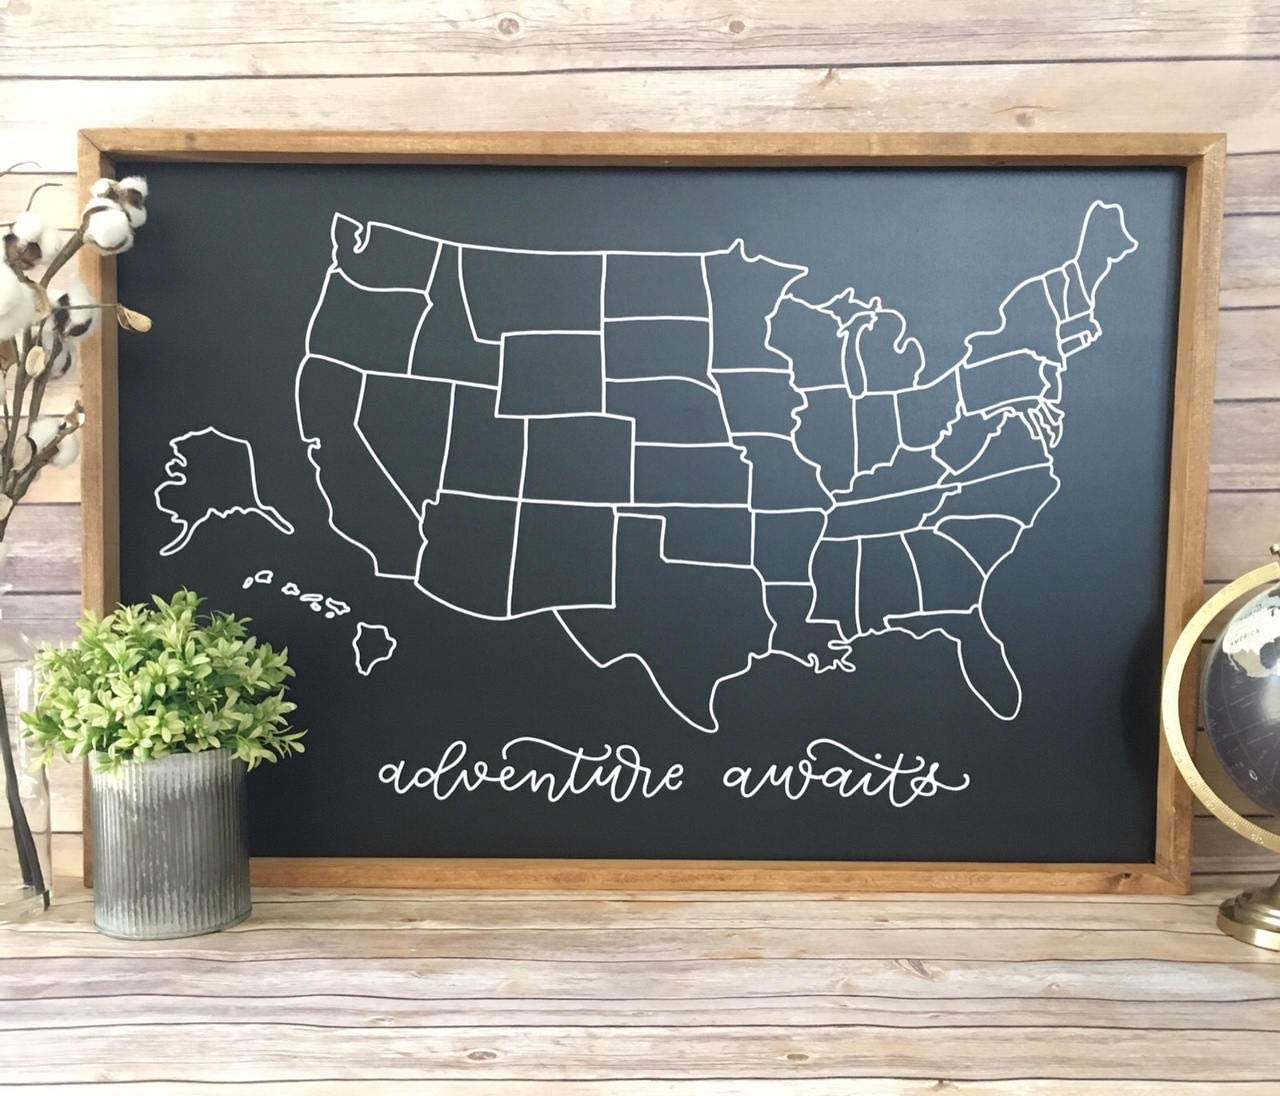 Chalkboard Map Of Us Amazon.com: EricauBird Wall Art US Chalkboard Map // Map of US